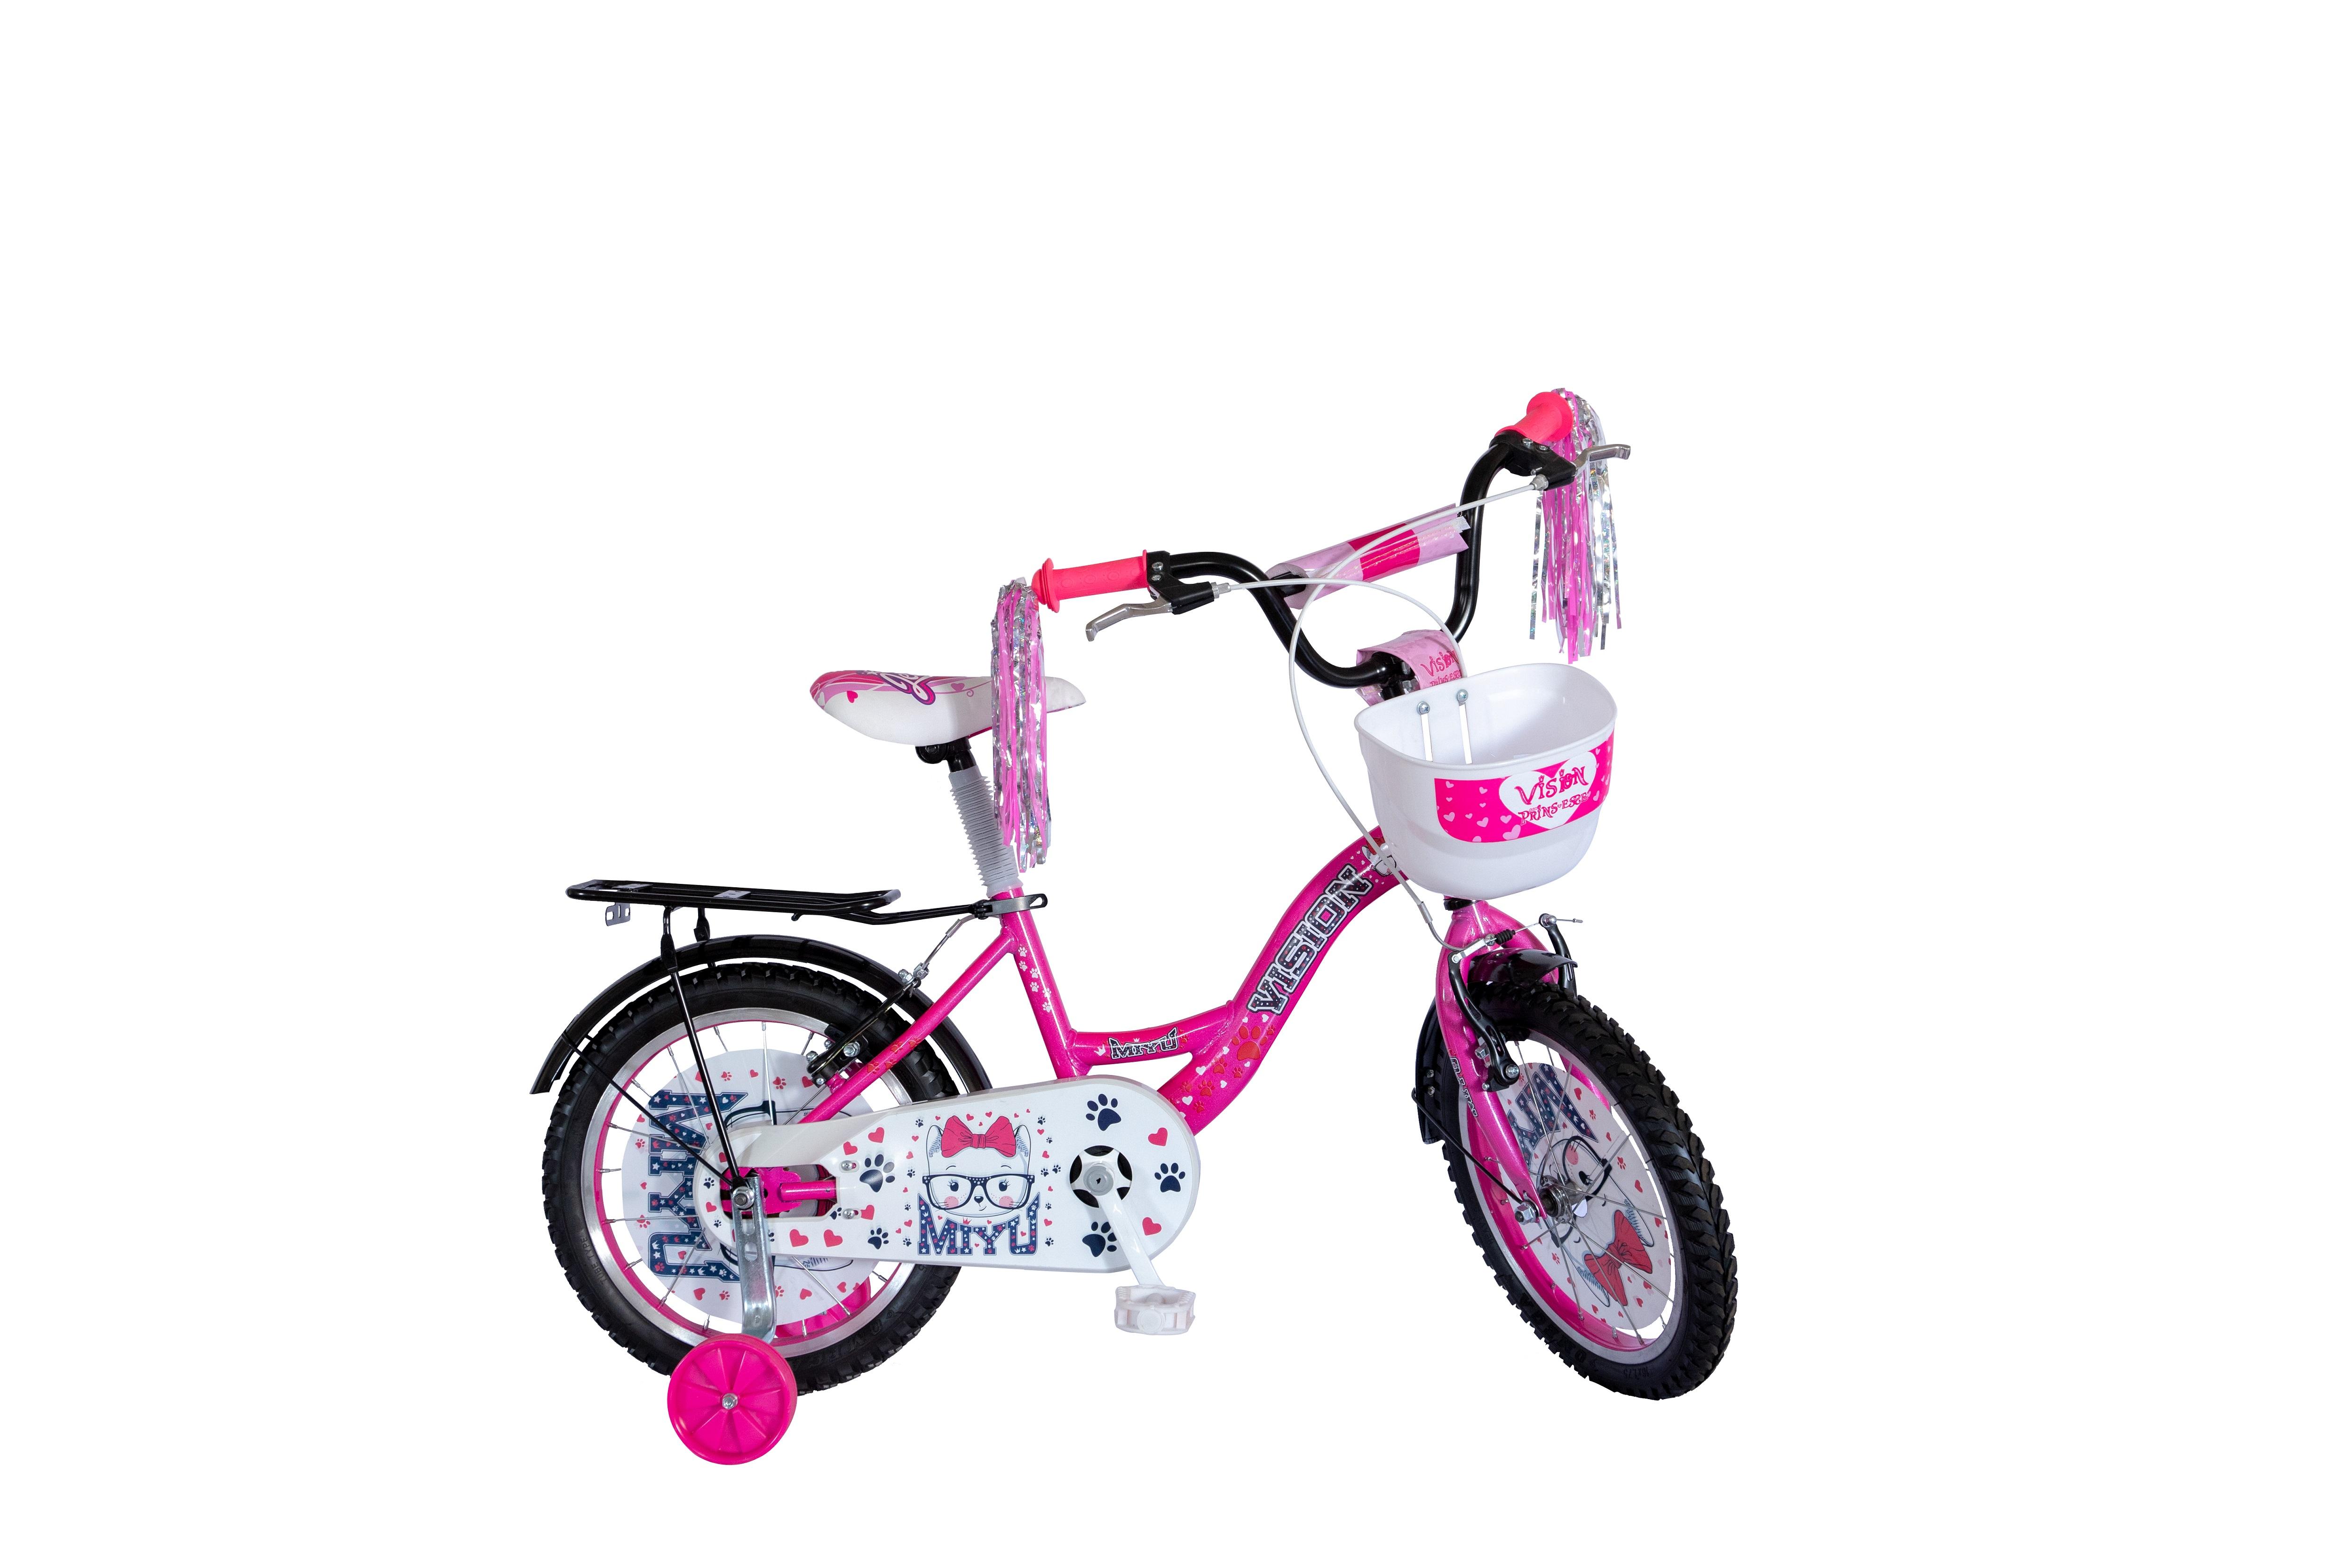 "Bicicleta Copii Vision Miyu Culoare Roz/Alb Roata 16"" Otel [0]"